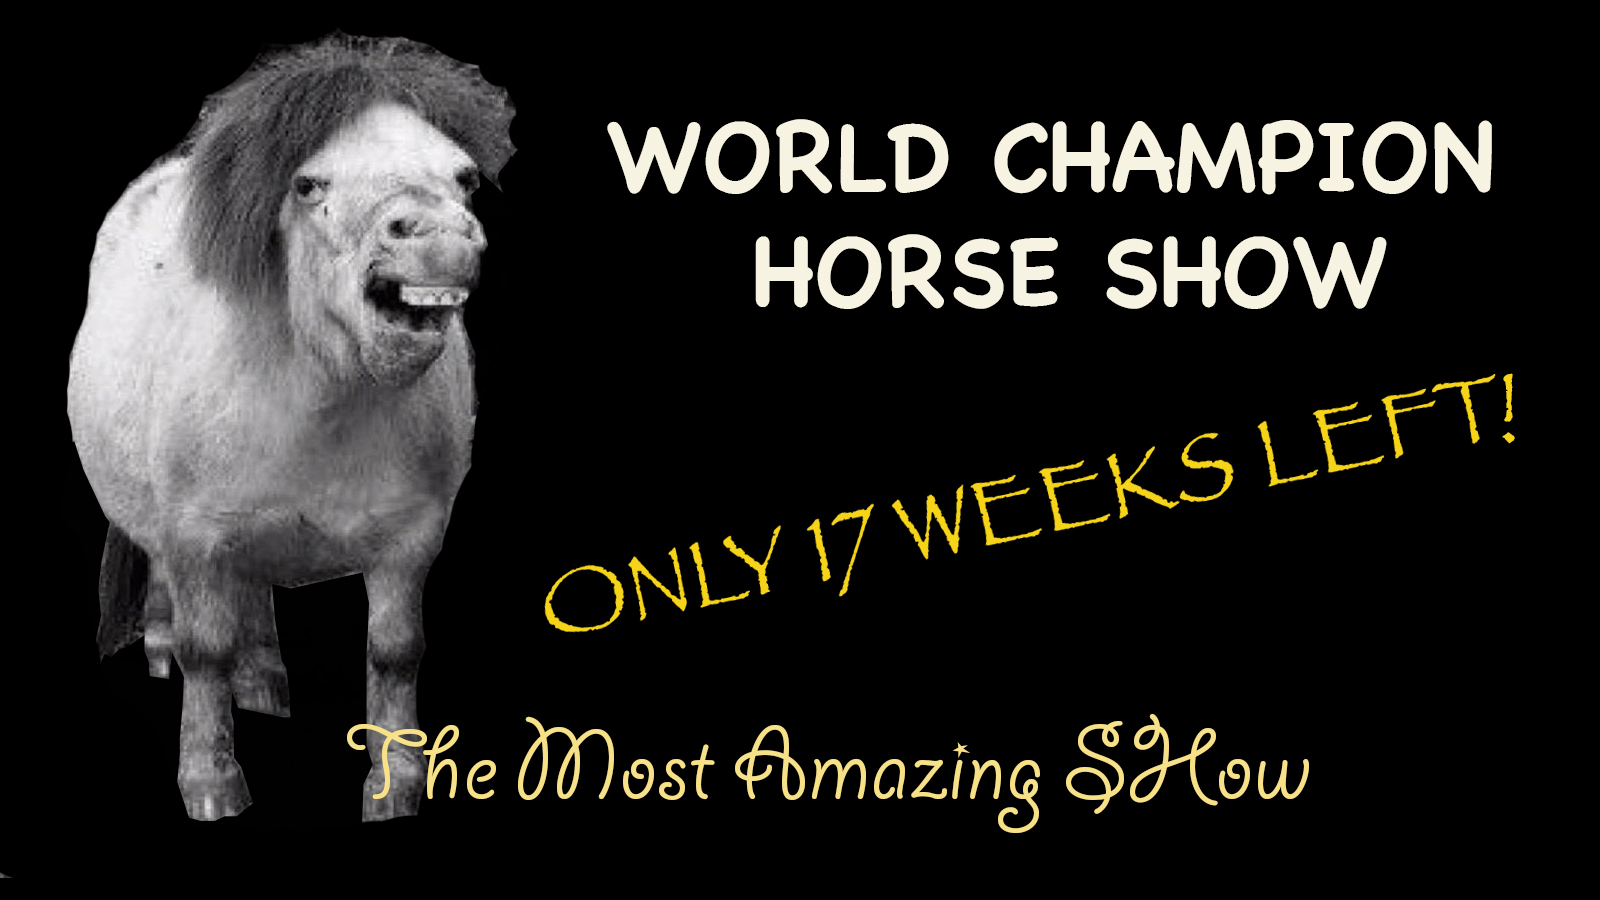 World Champion Horse Show